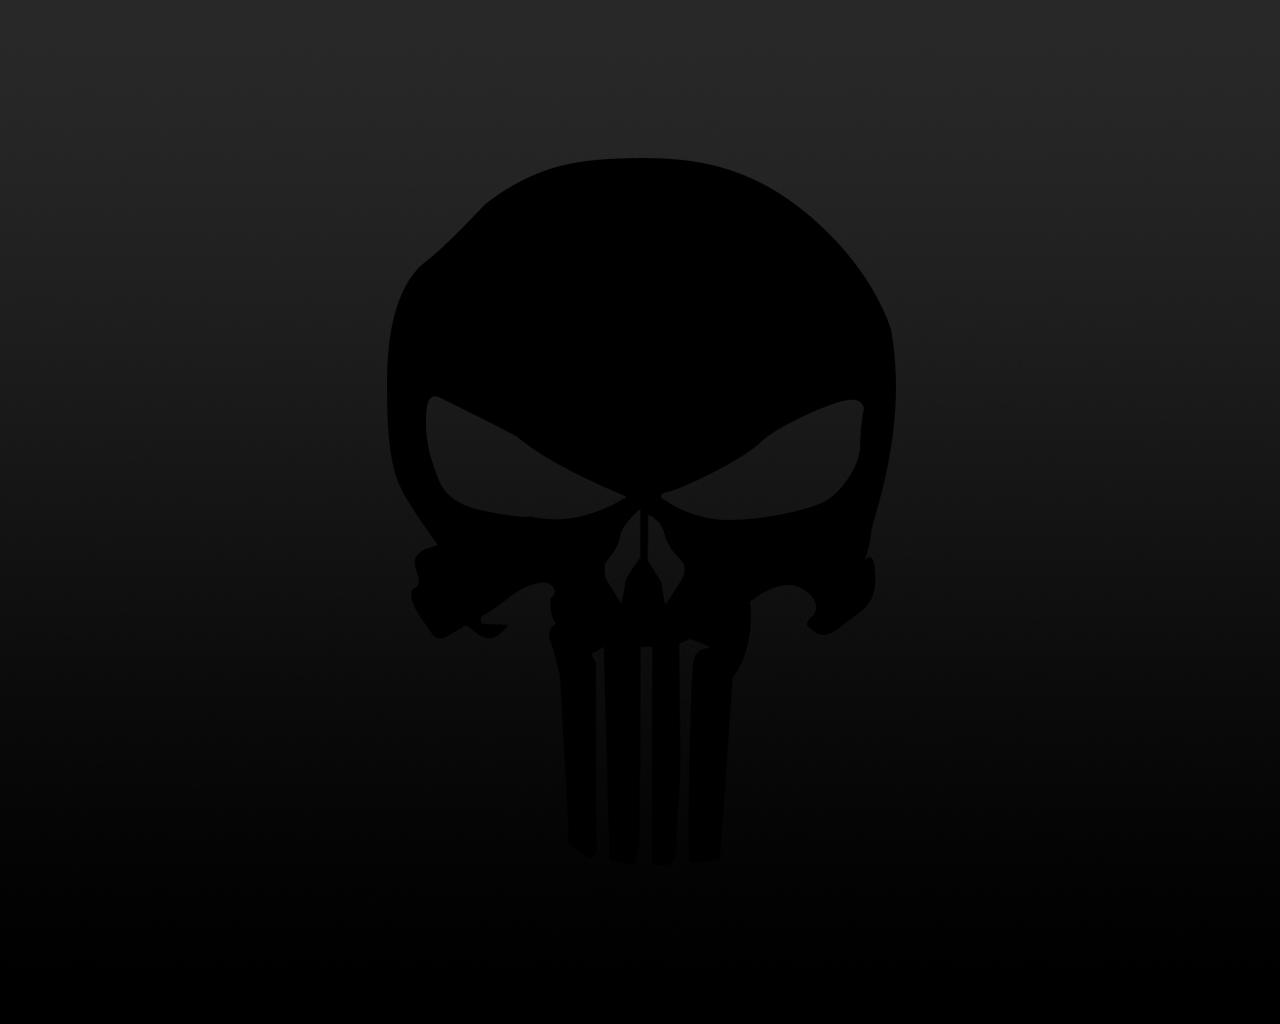 feedionetpunisher and skull wallpaper punisher and skull desktop 1280x1024